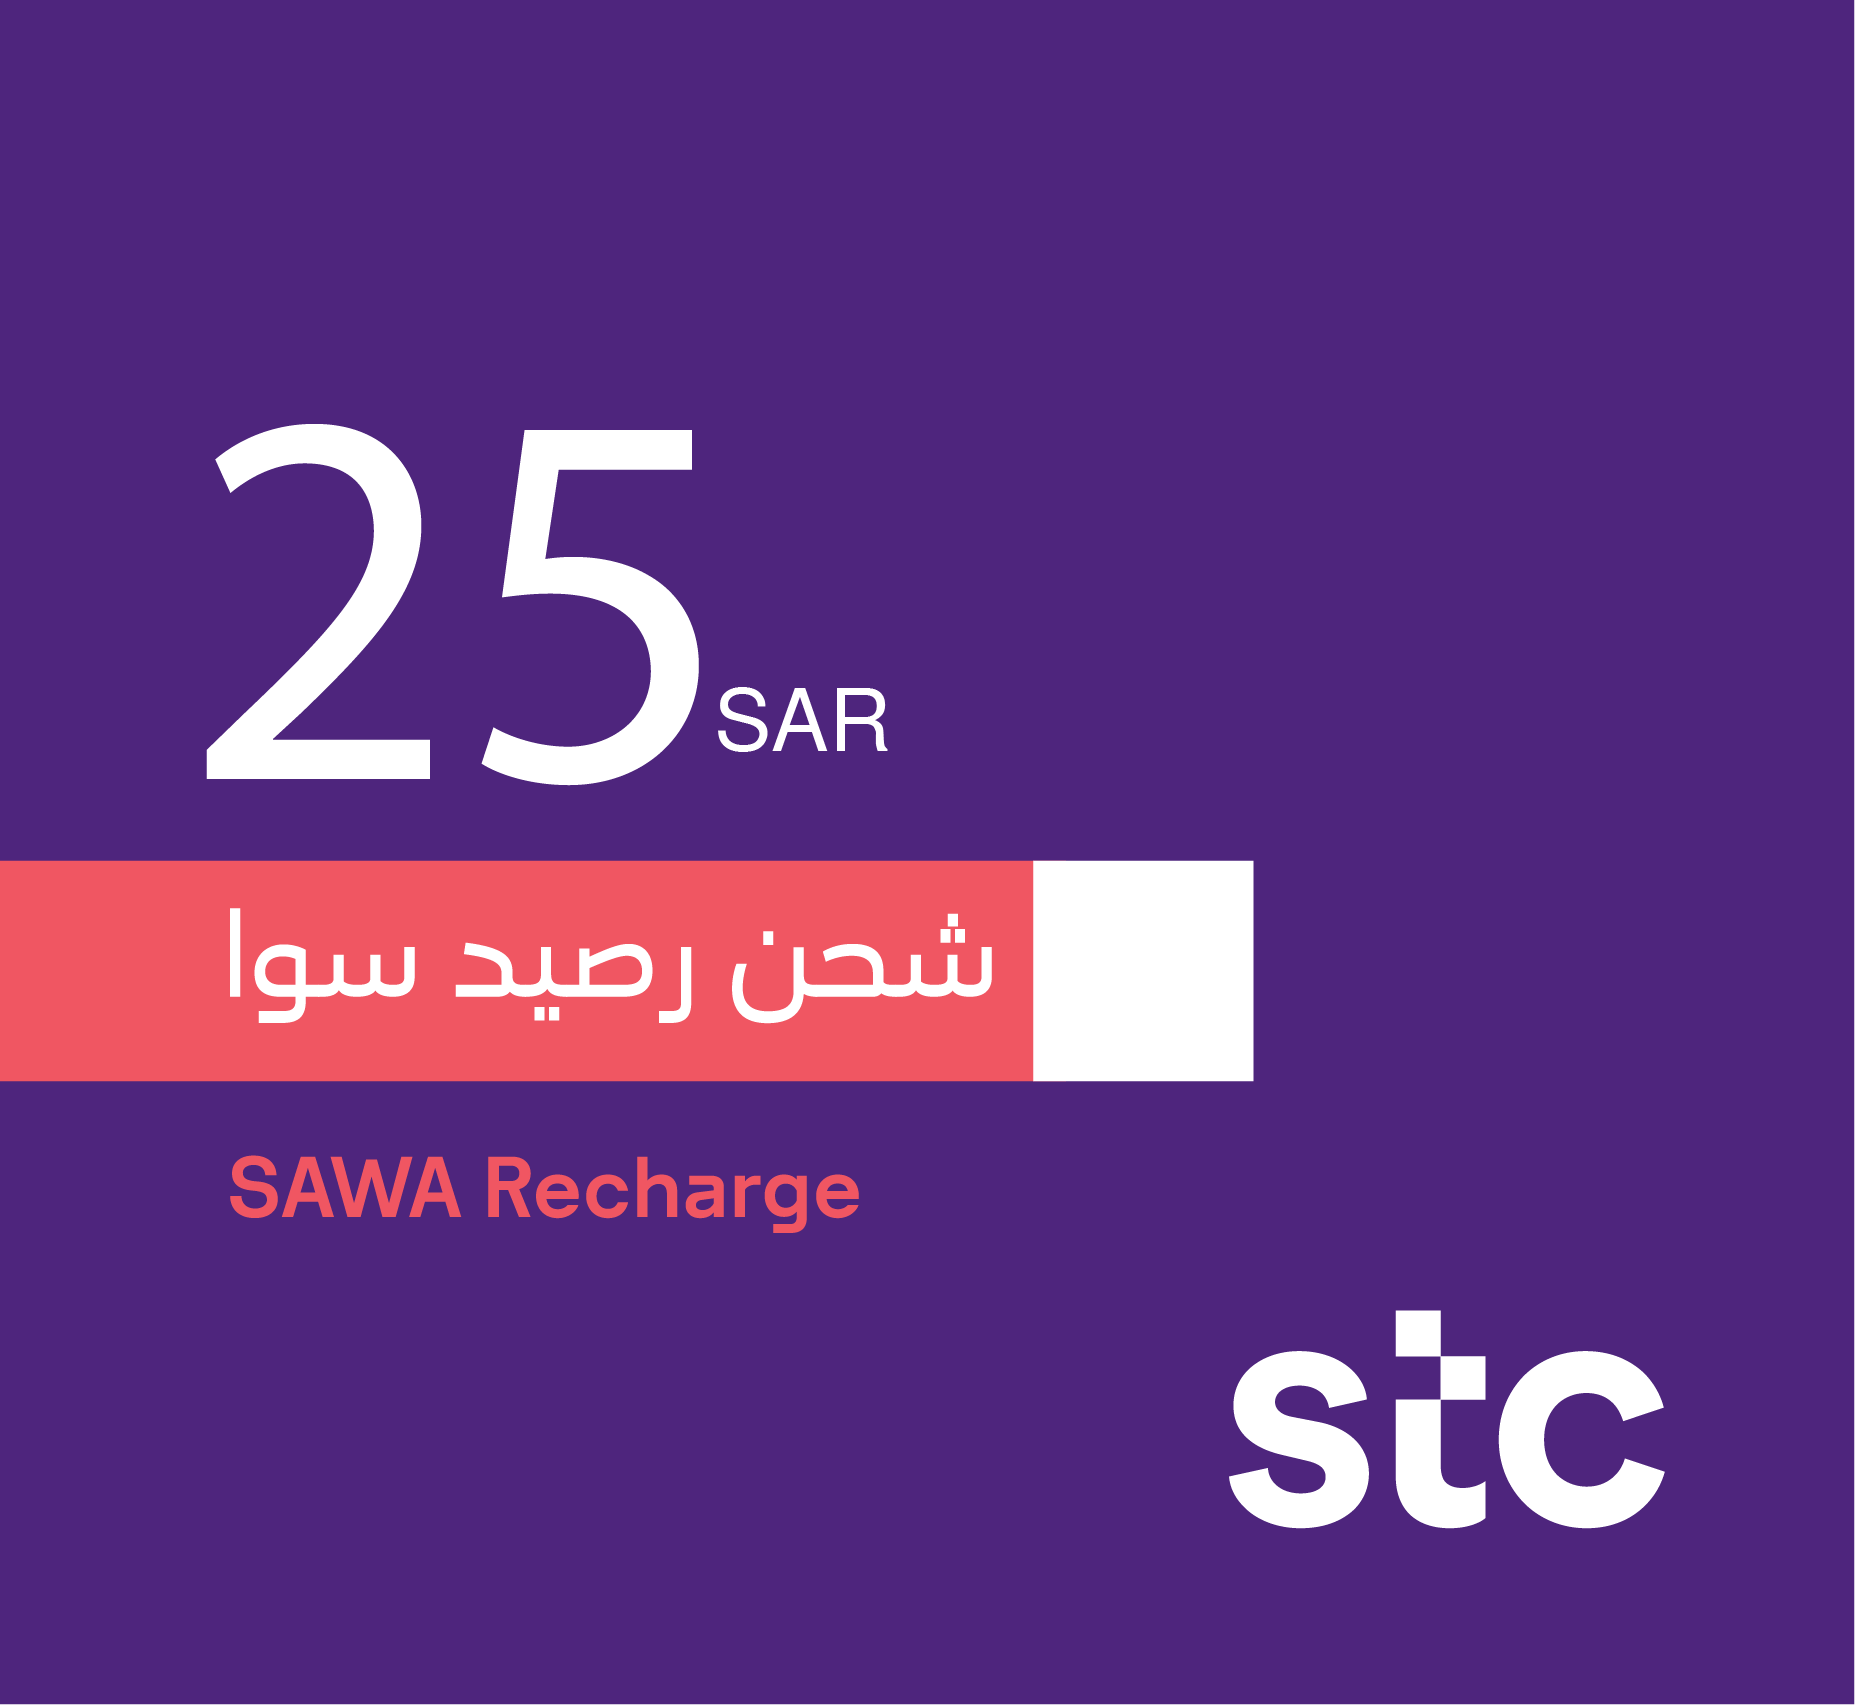 Sawa Recharge Card SR 25